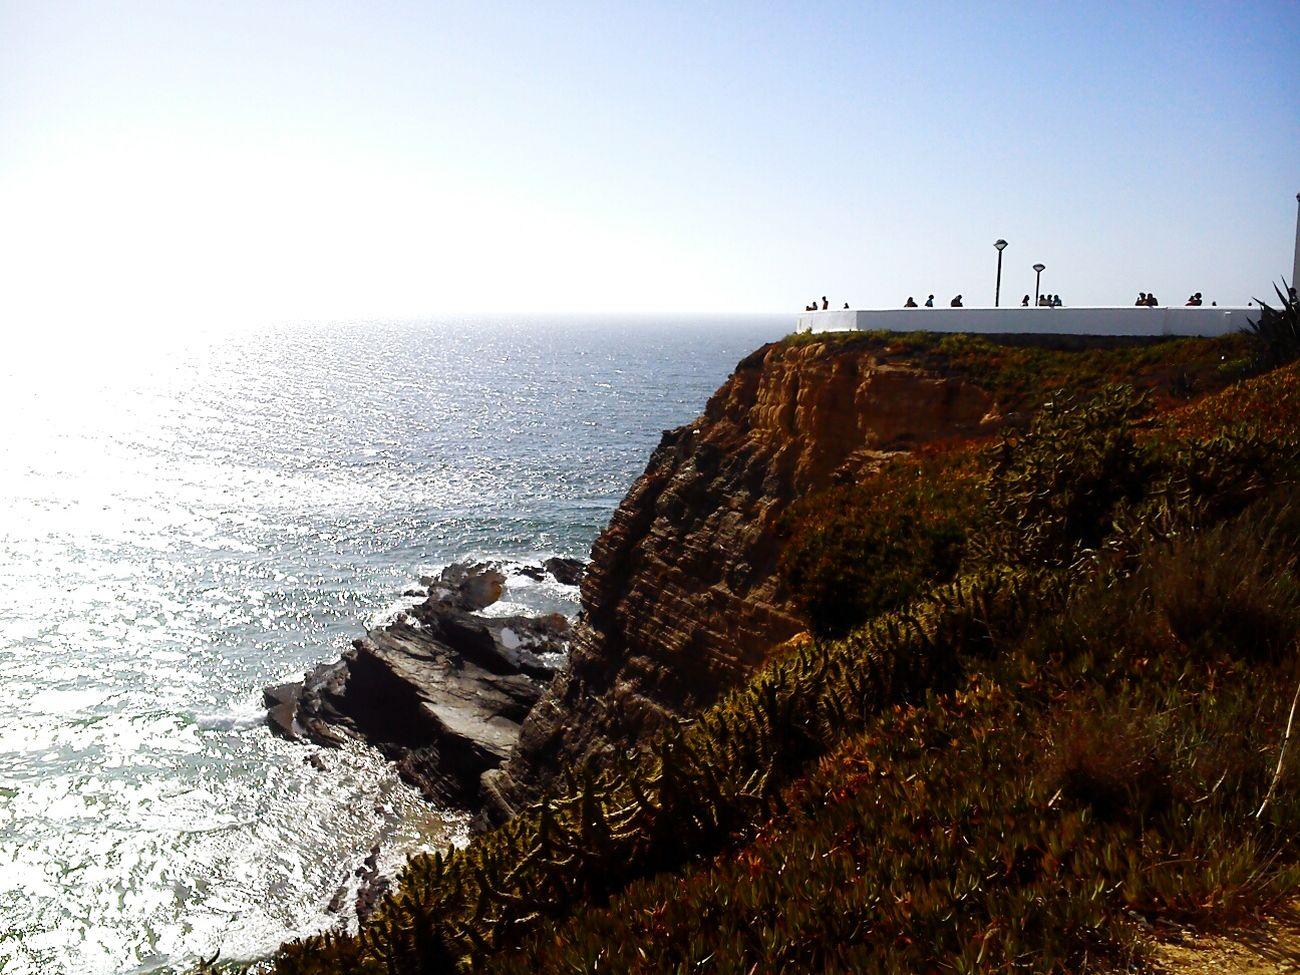 Portugal Endoftheworld Cabodesaovicente